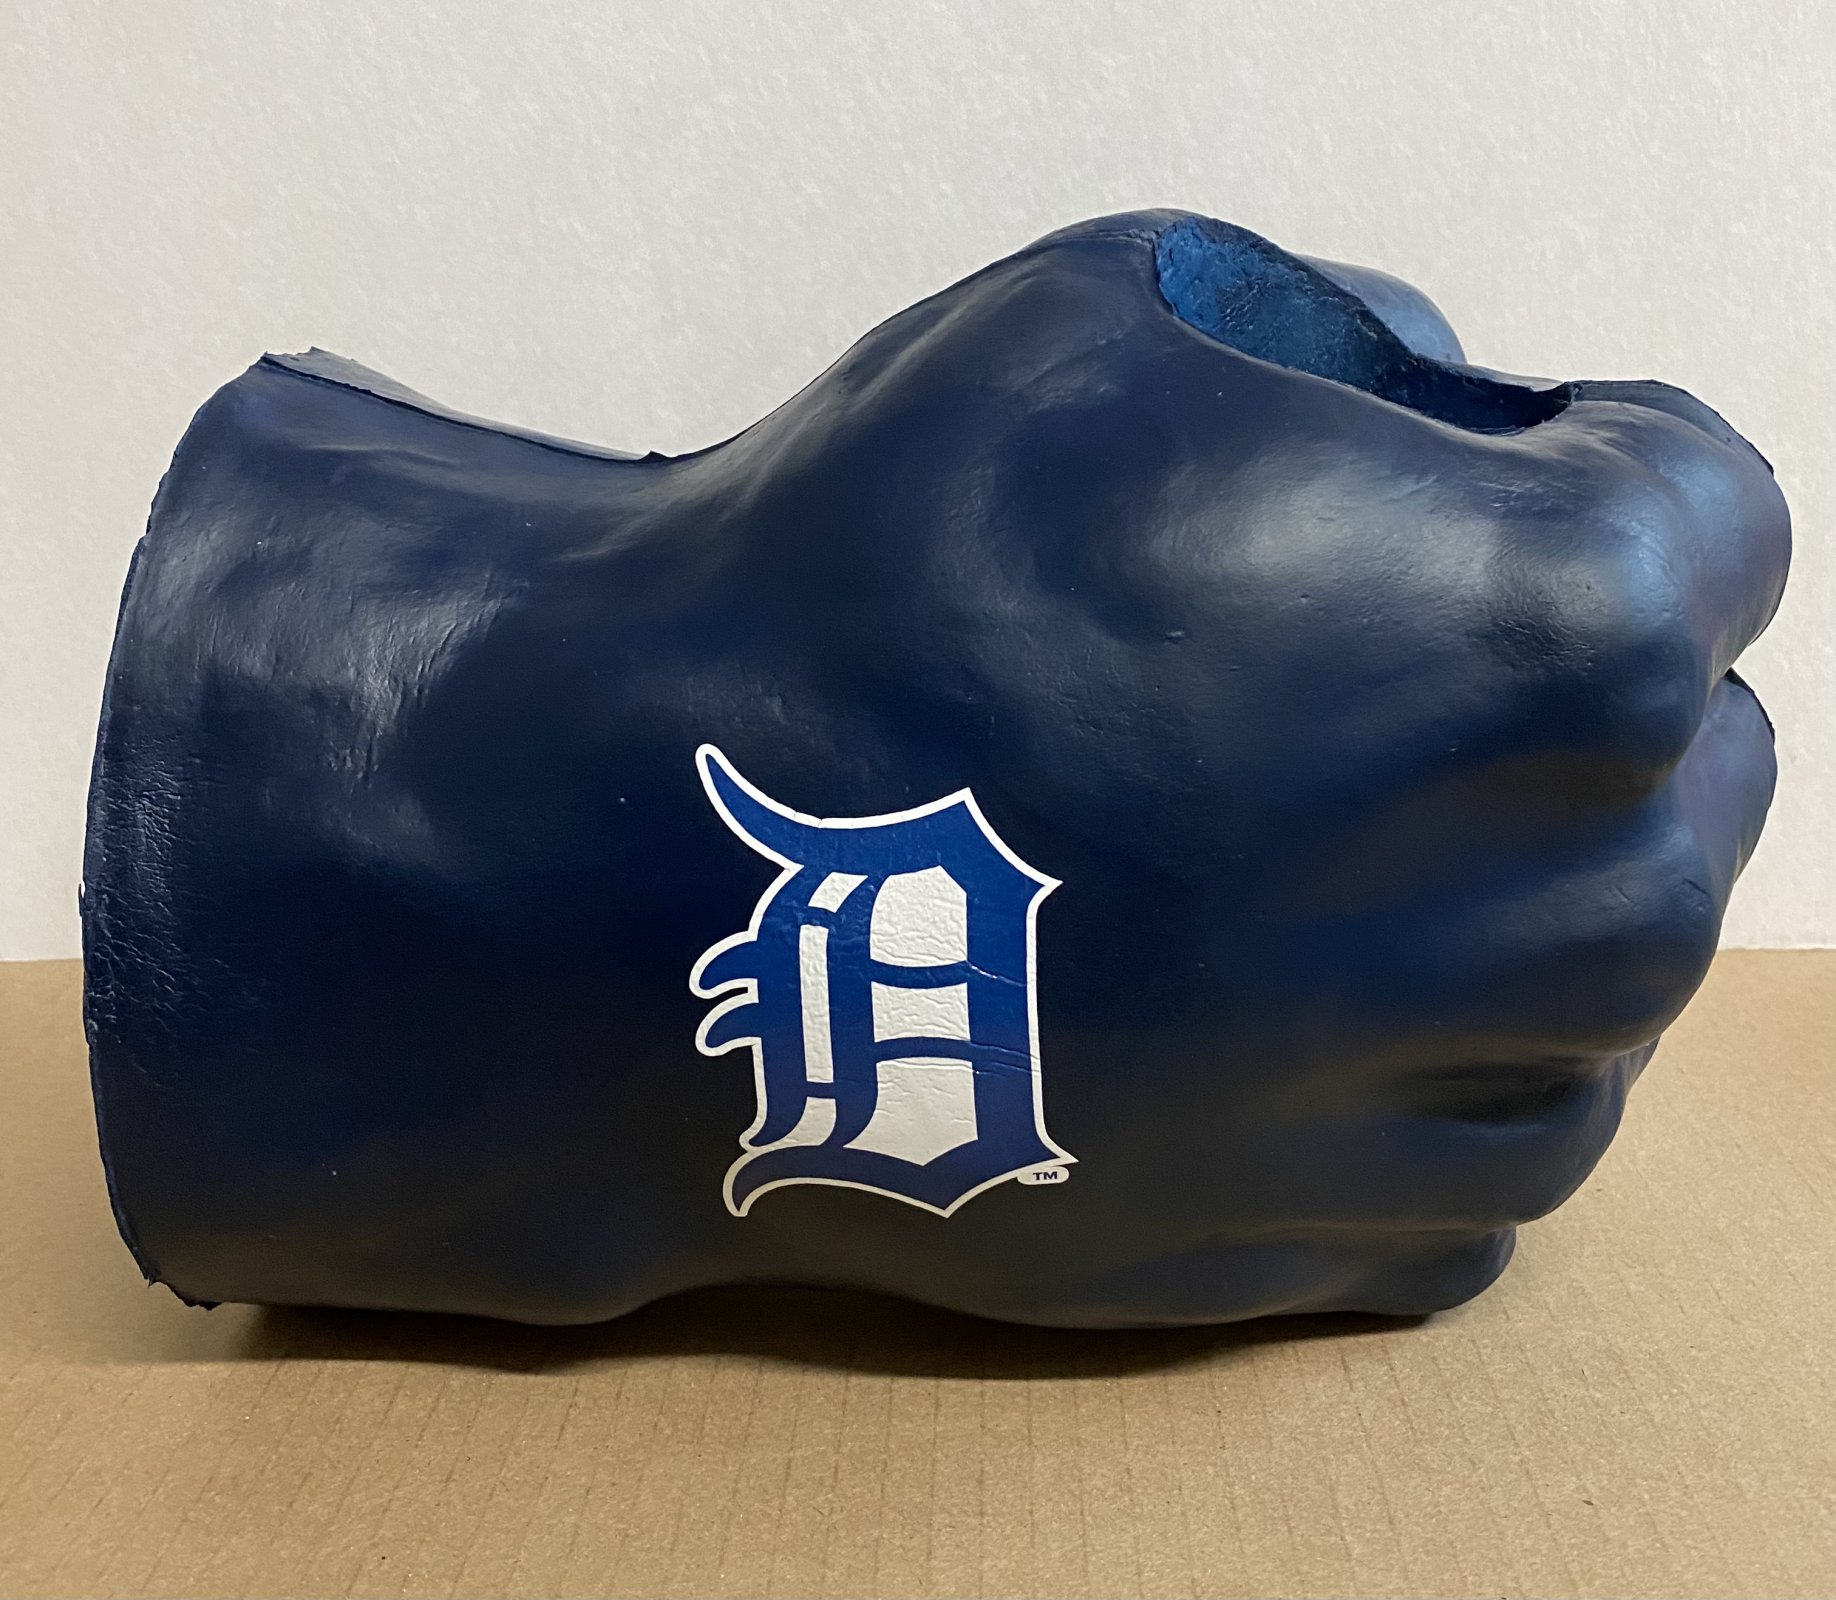 Detroit Tigers Fist Drink Holder